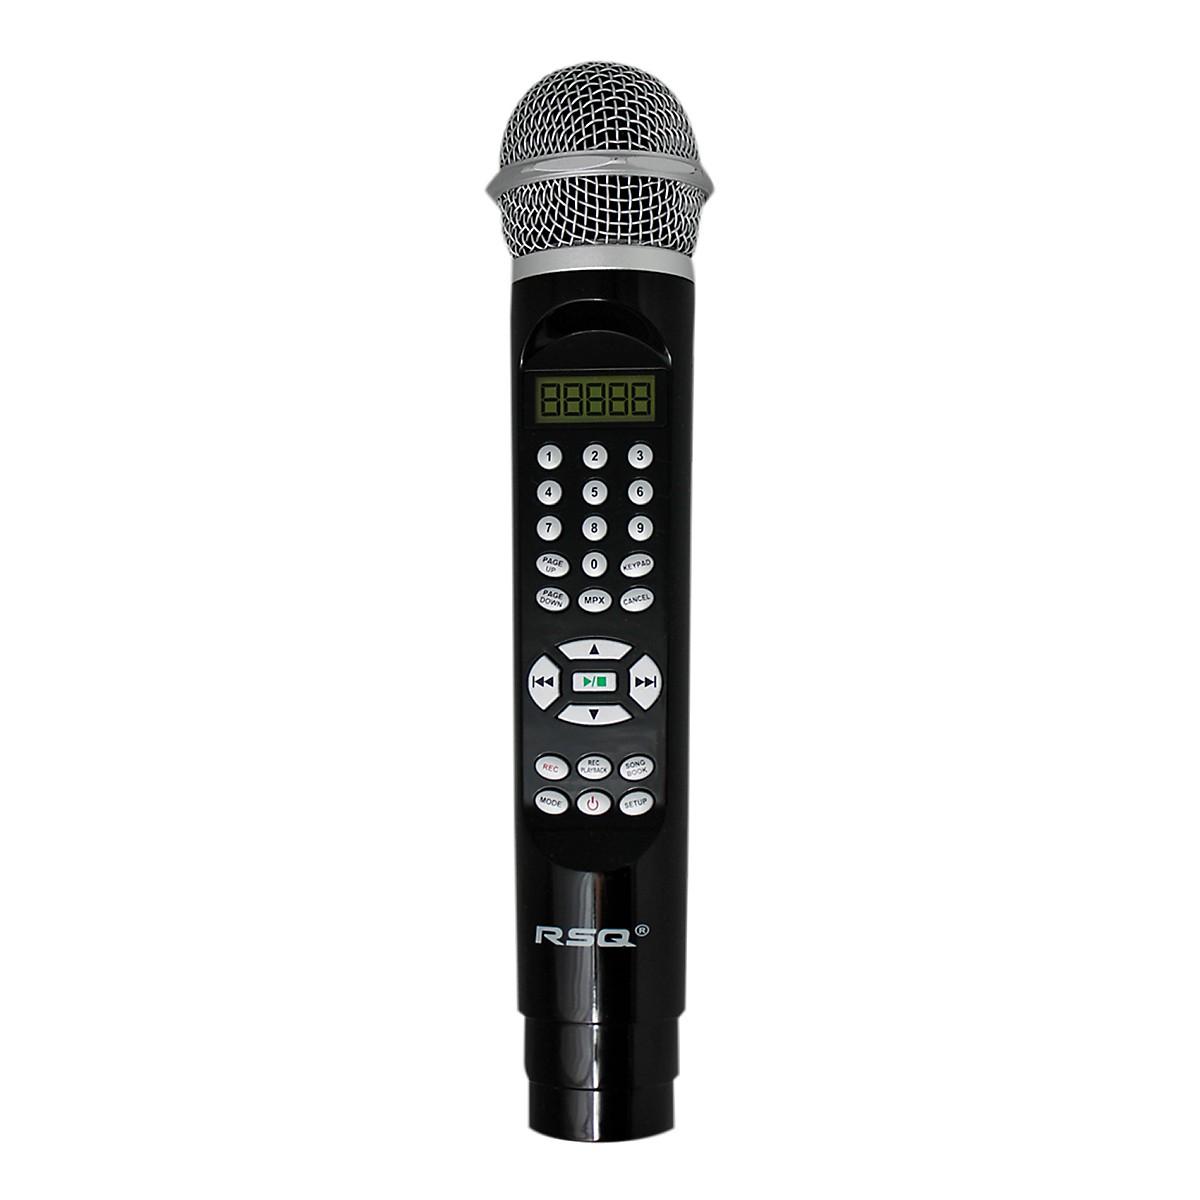 RSQ HSK-202 Microphone Karaoke Player